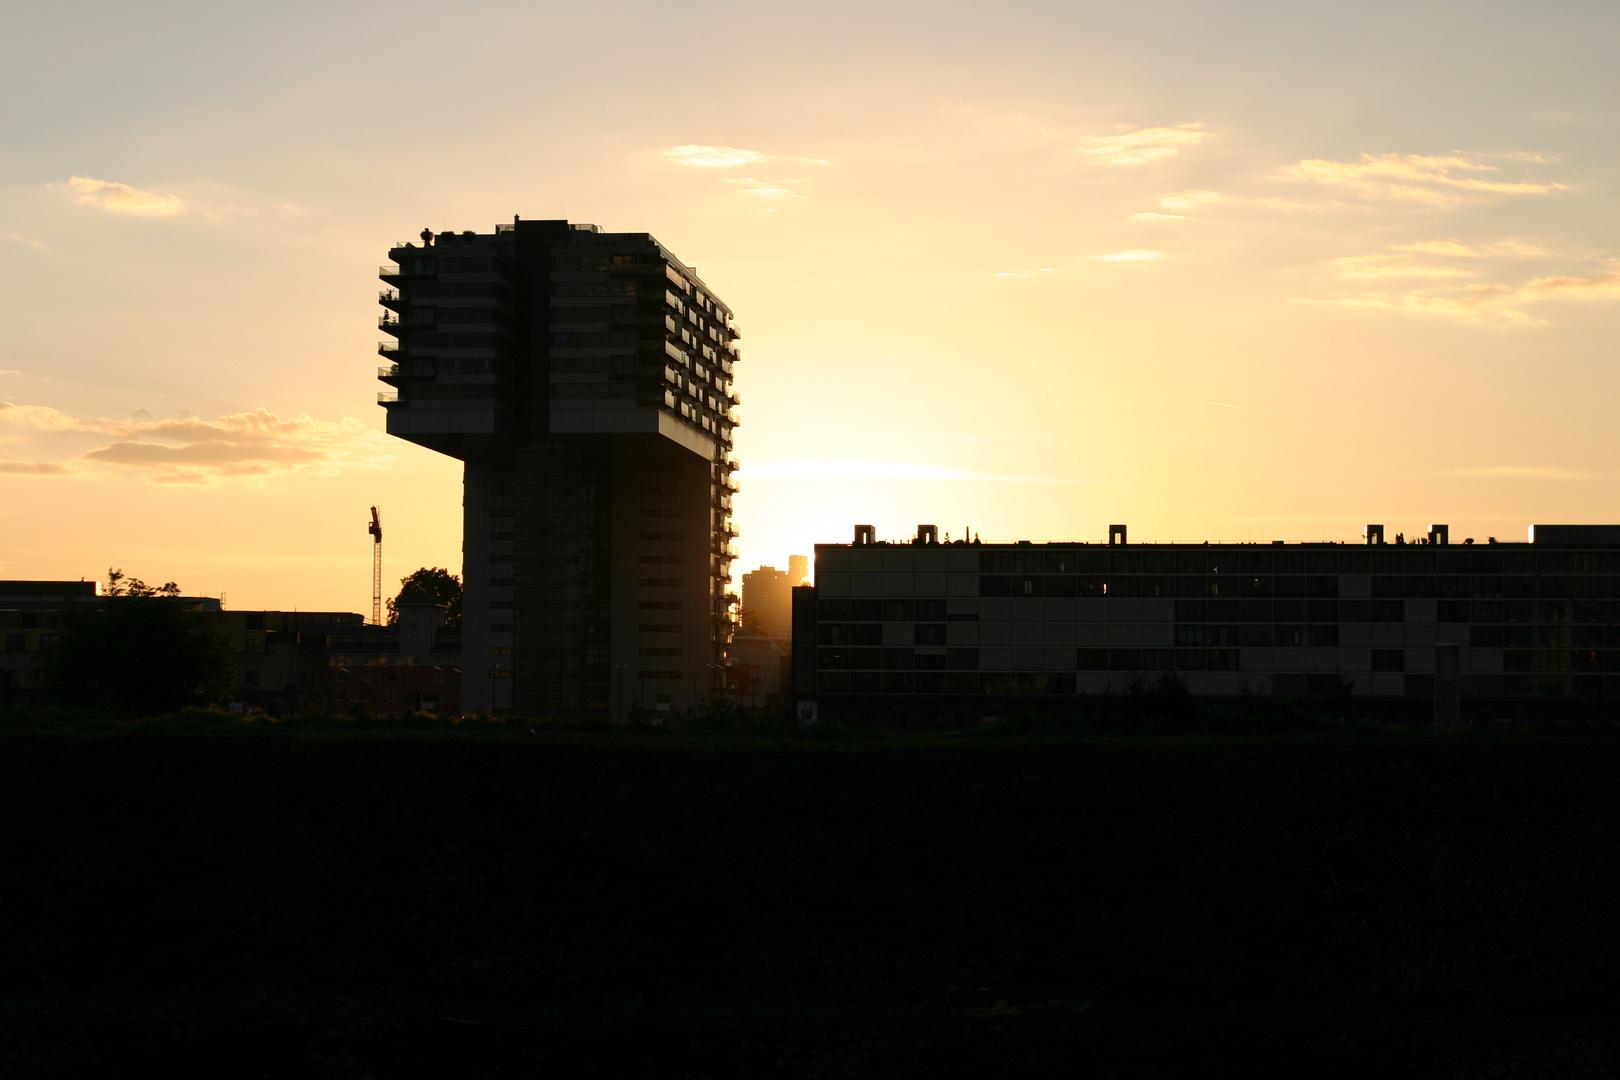 Hafenbauten bei Sonnenuntergang